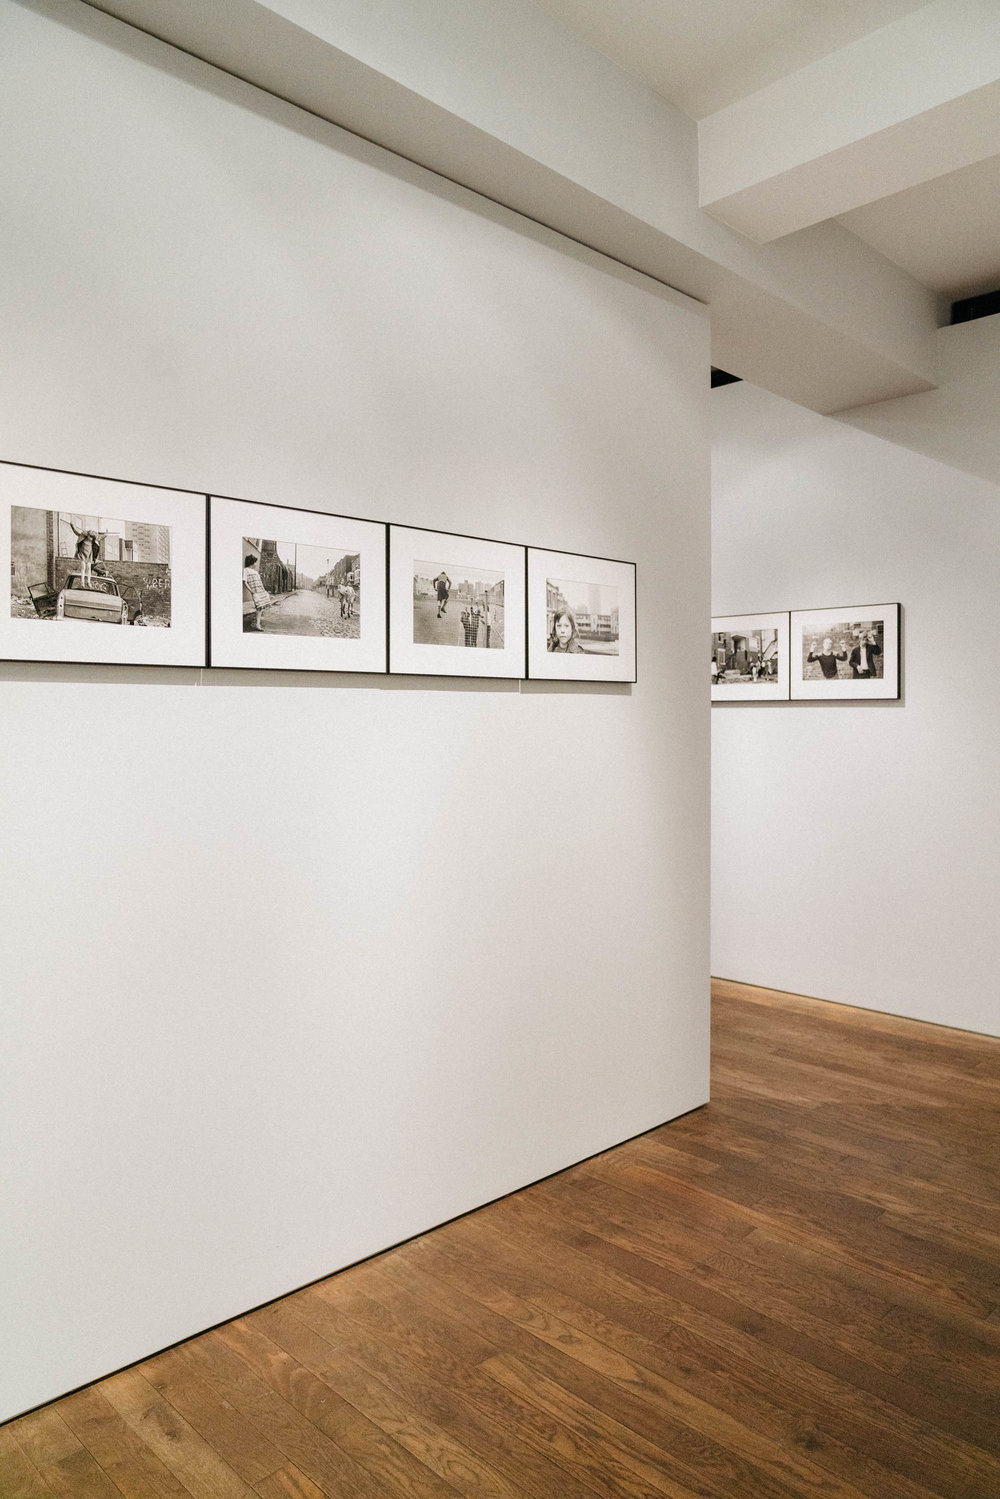 Tish Murtha: Works 1976-1991